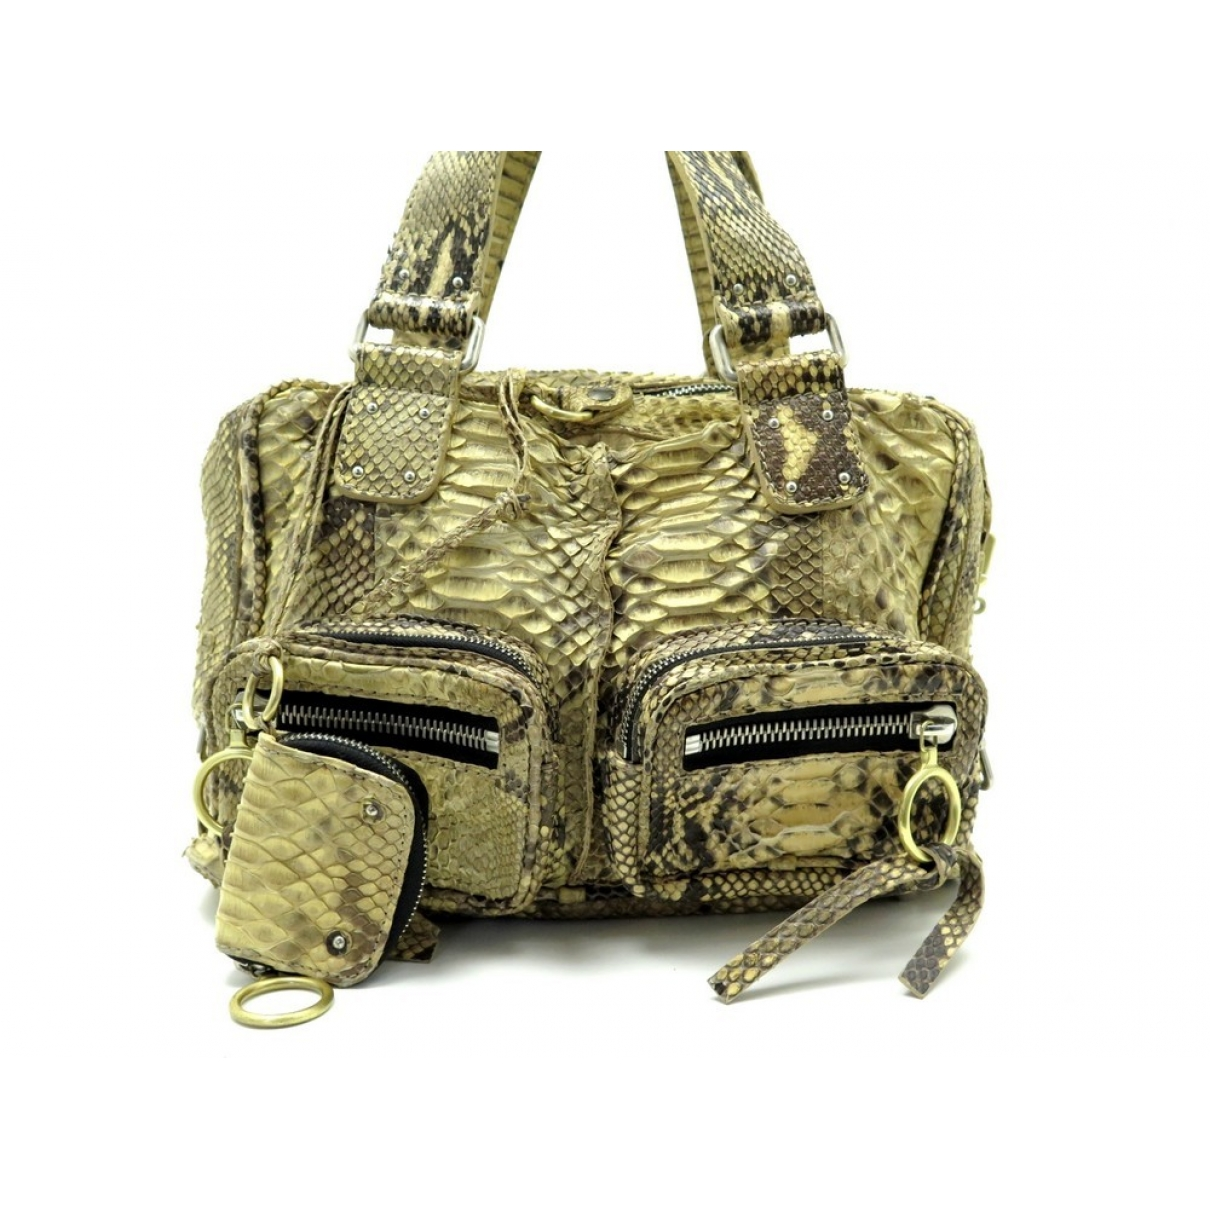 Chloe \N Handtasche in  Gelb Exotenleder